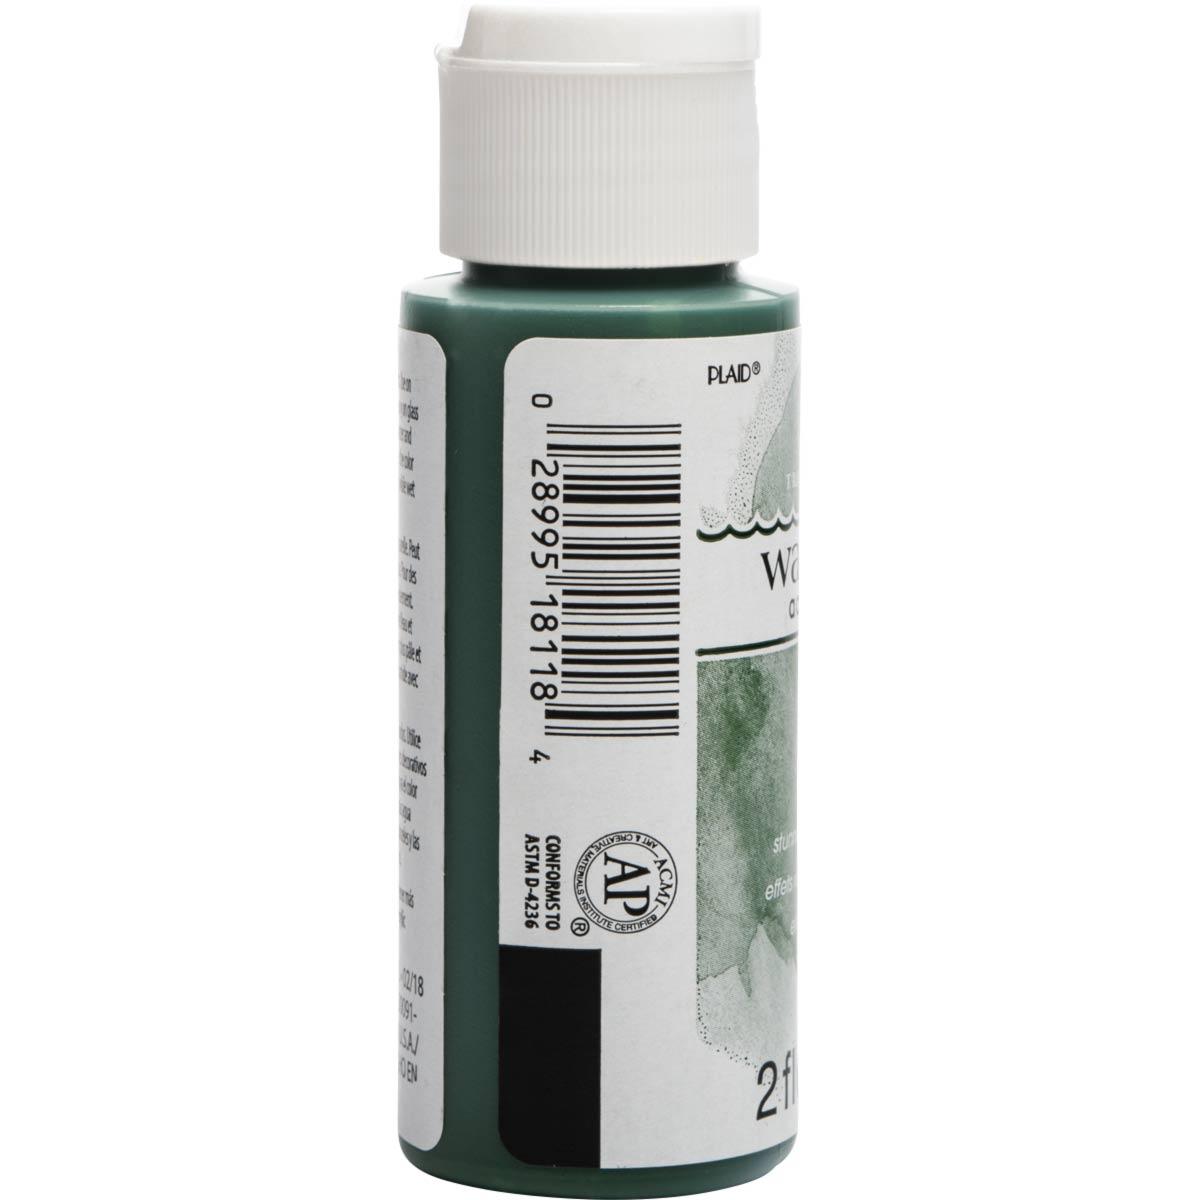 FolkArt ® Watercolor Acrylic Paint™ - Sap Green, 2 oz. - 18118